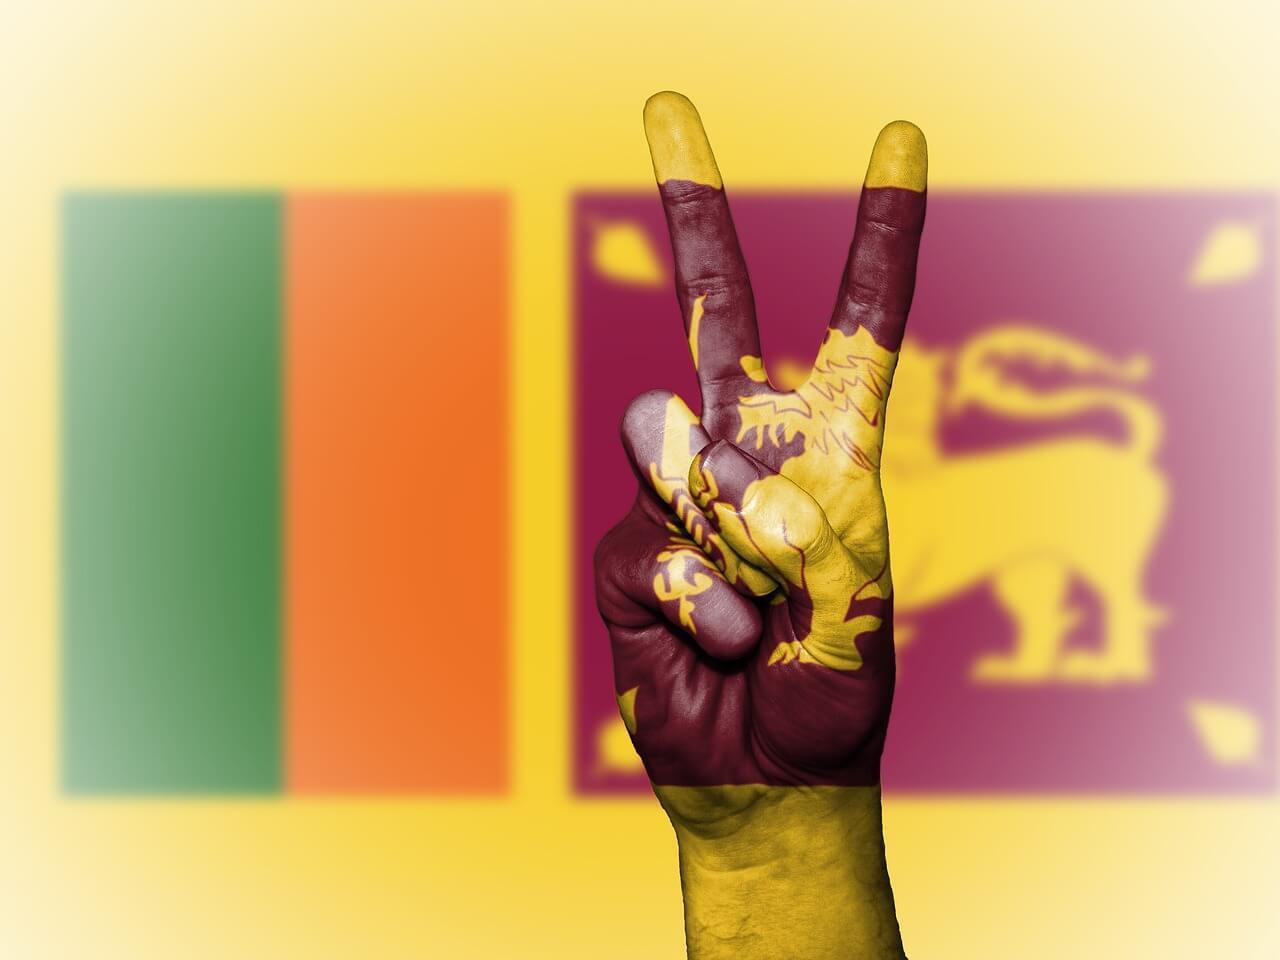 Peace sign over Sri Lanka's flag